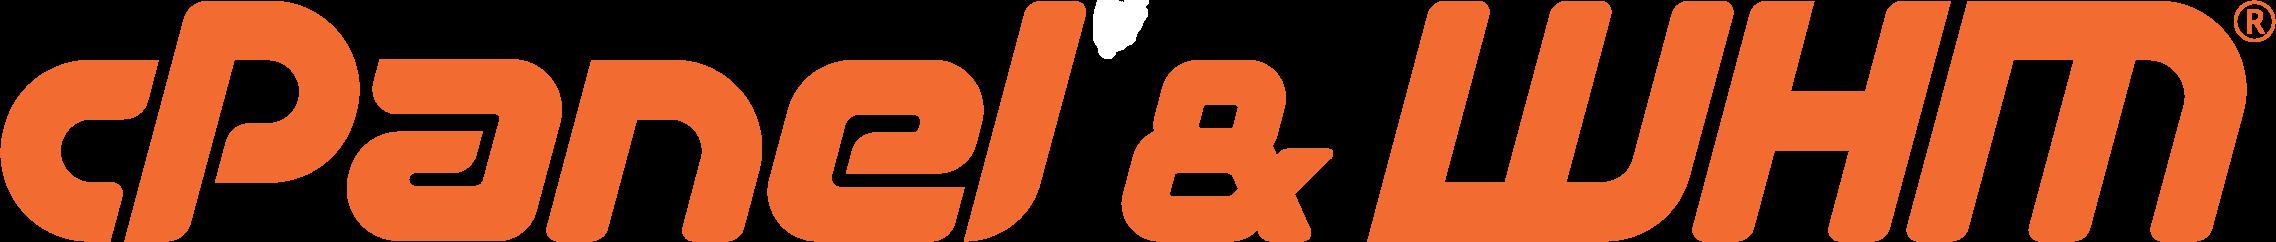 cpanel-whm-logo-RGB-v070816.png